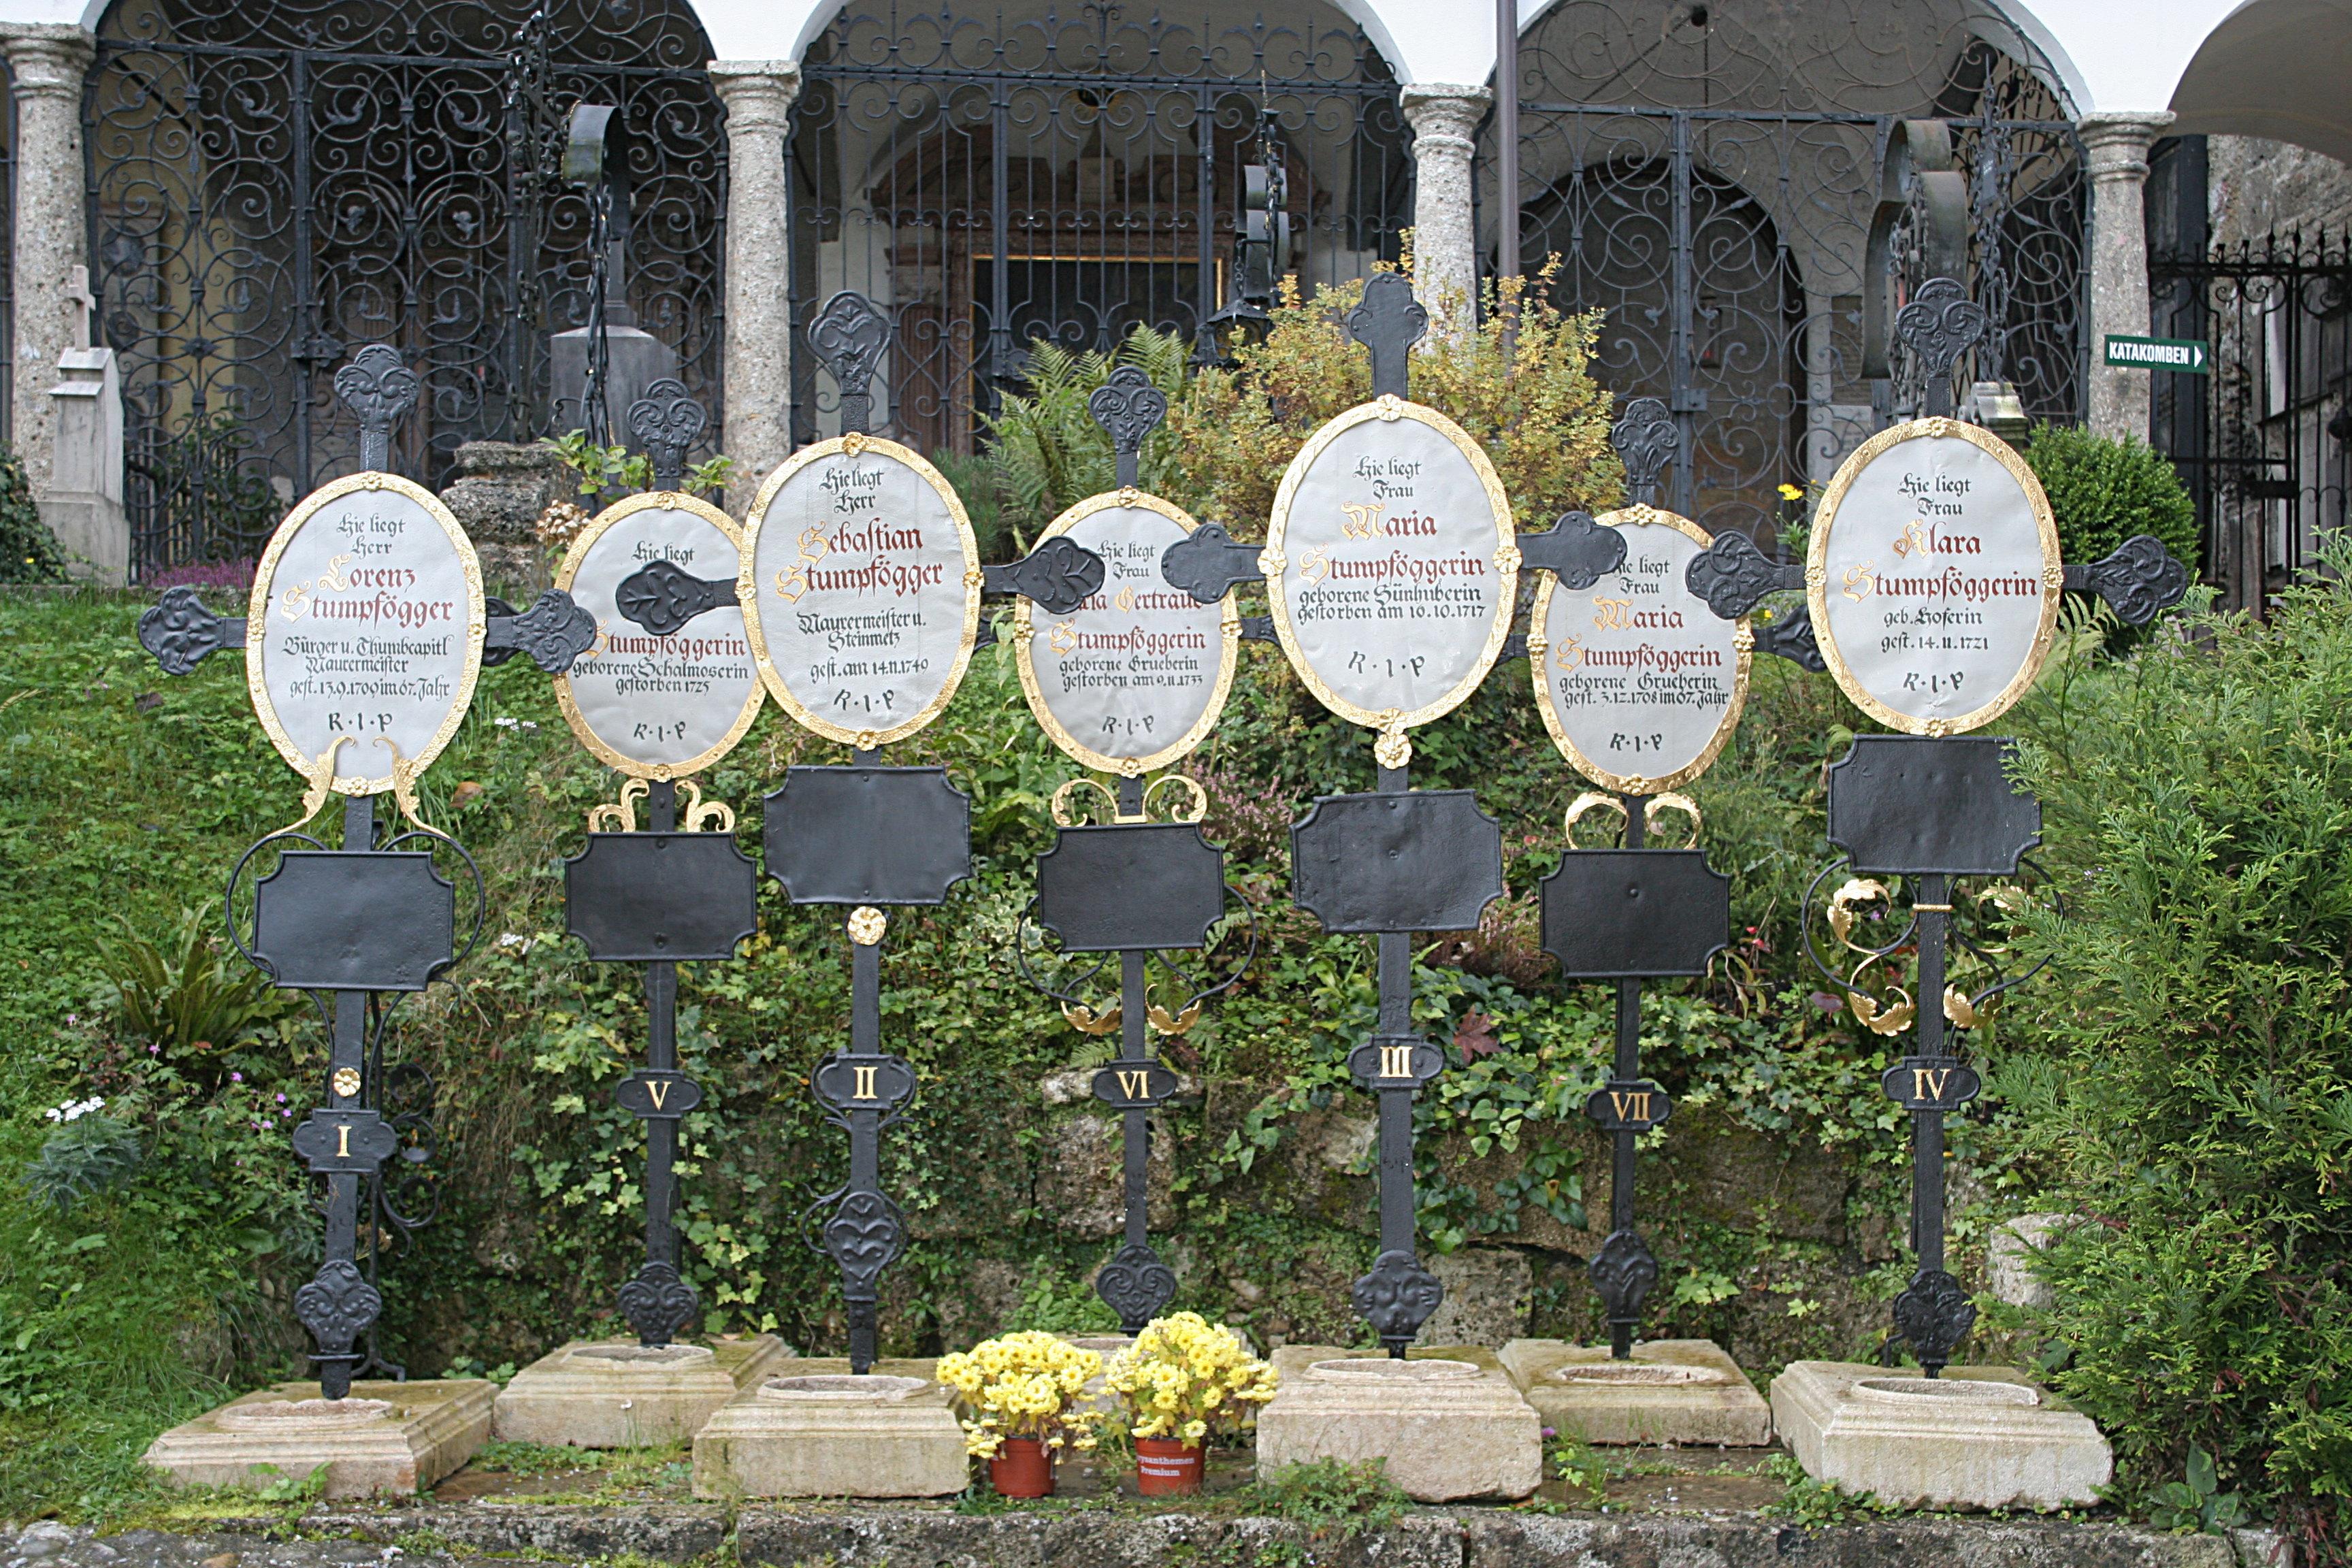 File:Salzburger st peters friedhof 7 kreuze.jpg.